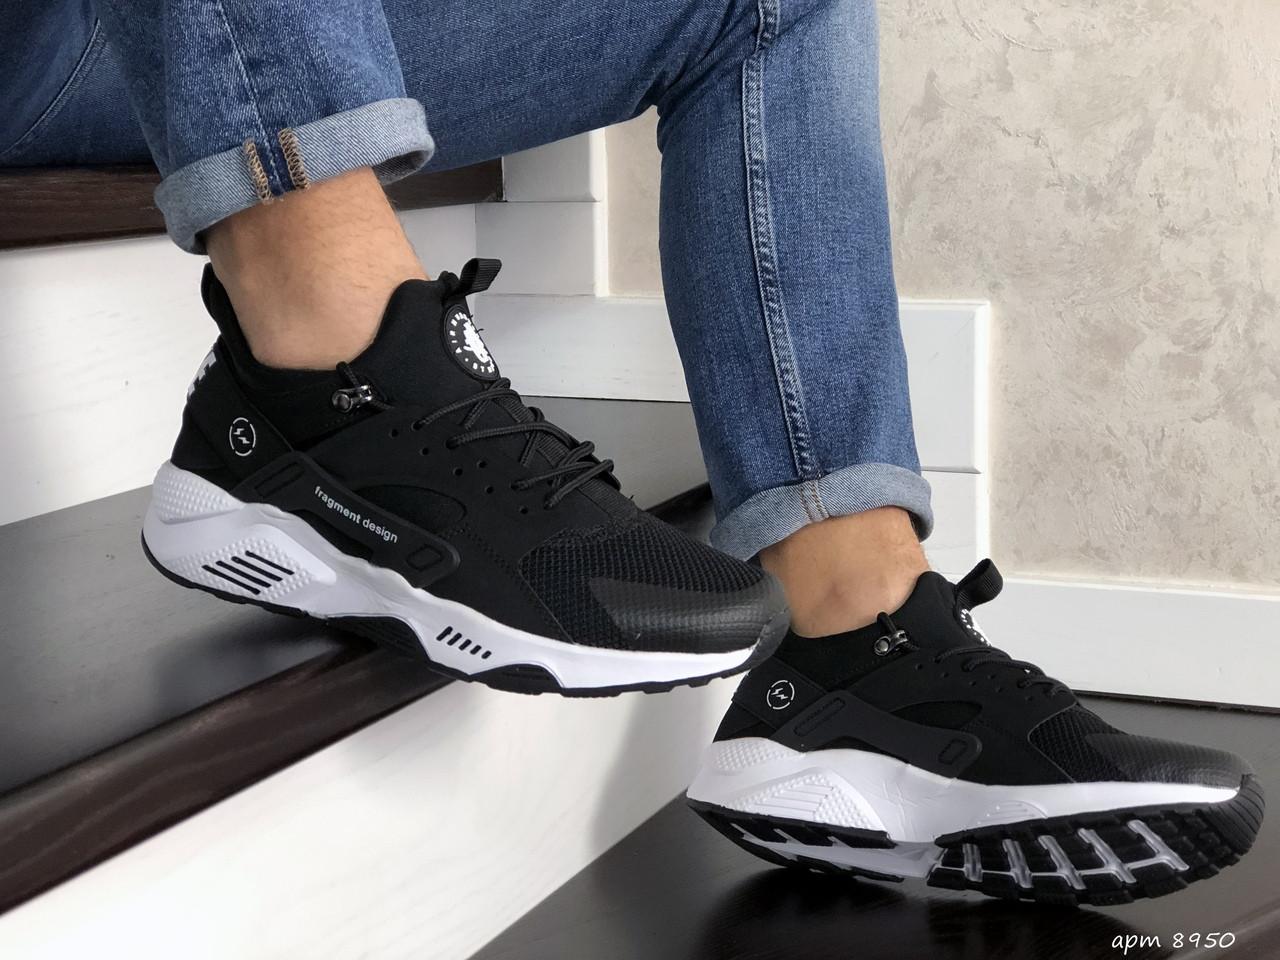 Мужские кроссовки Nike Huarache Fragment Design (черно-белые) 8950